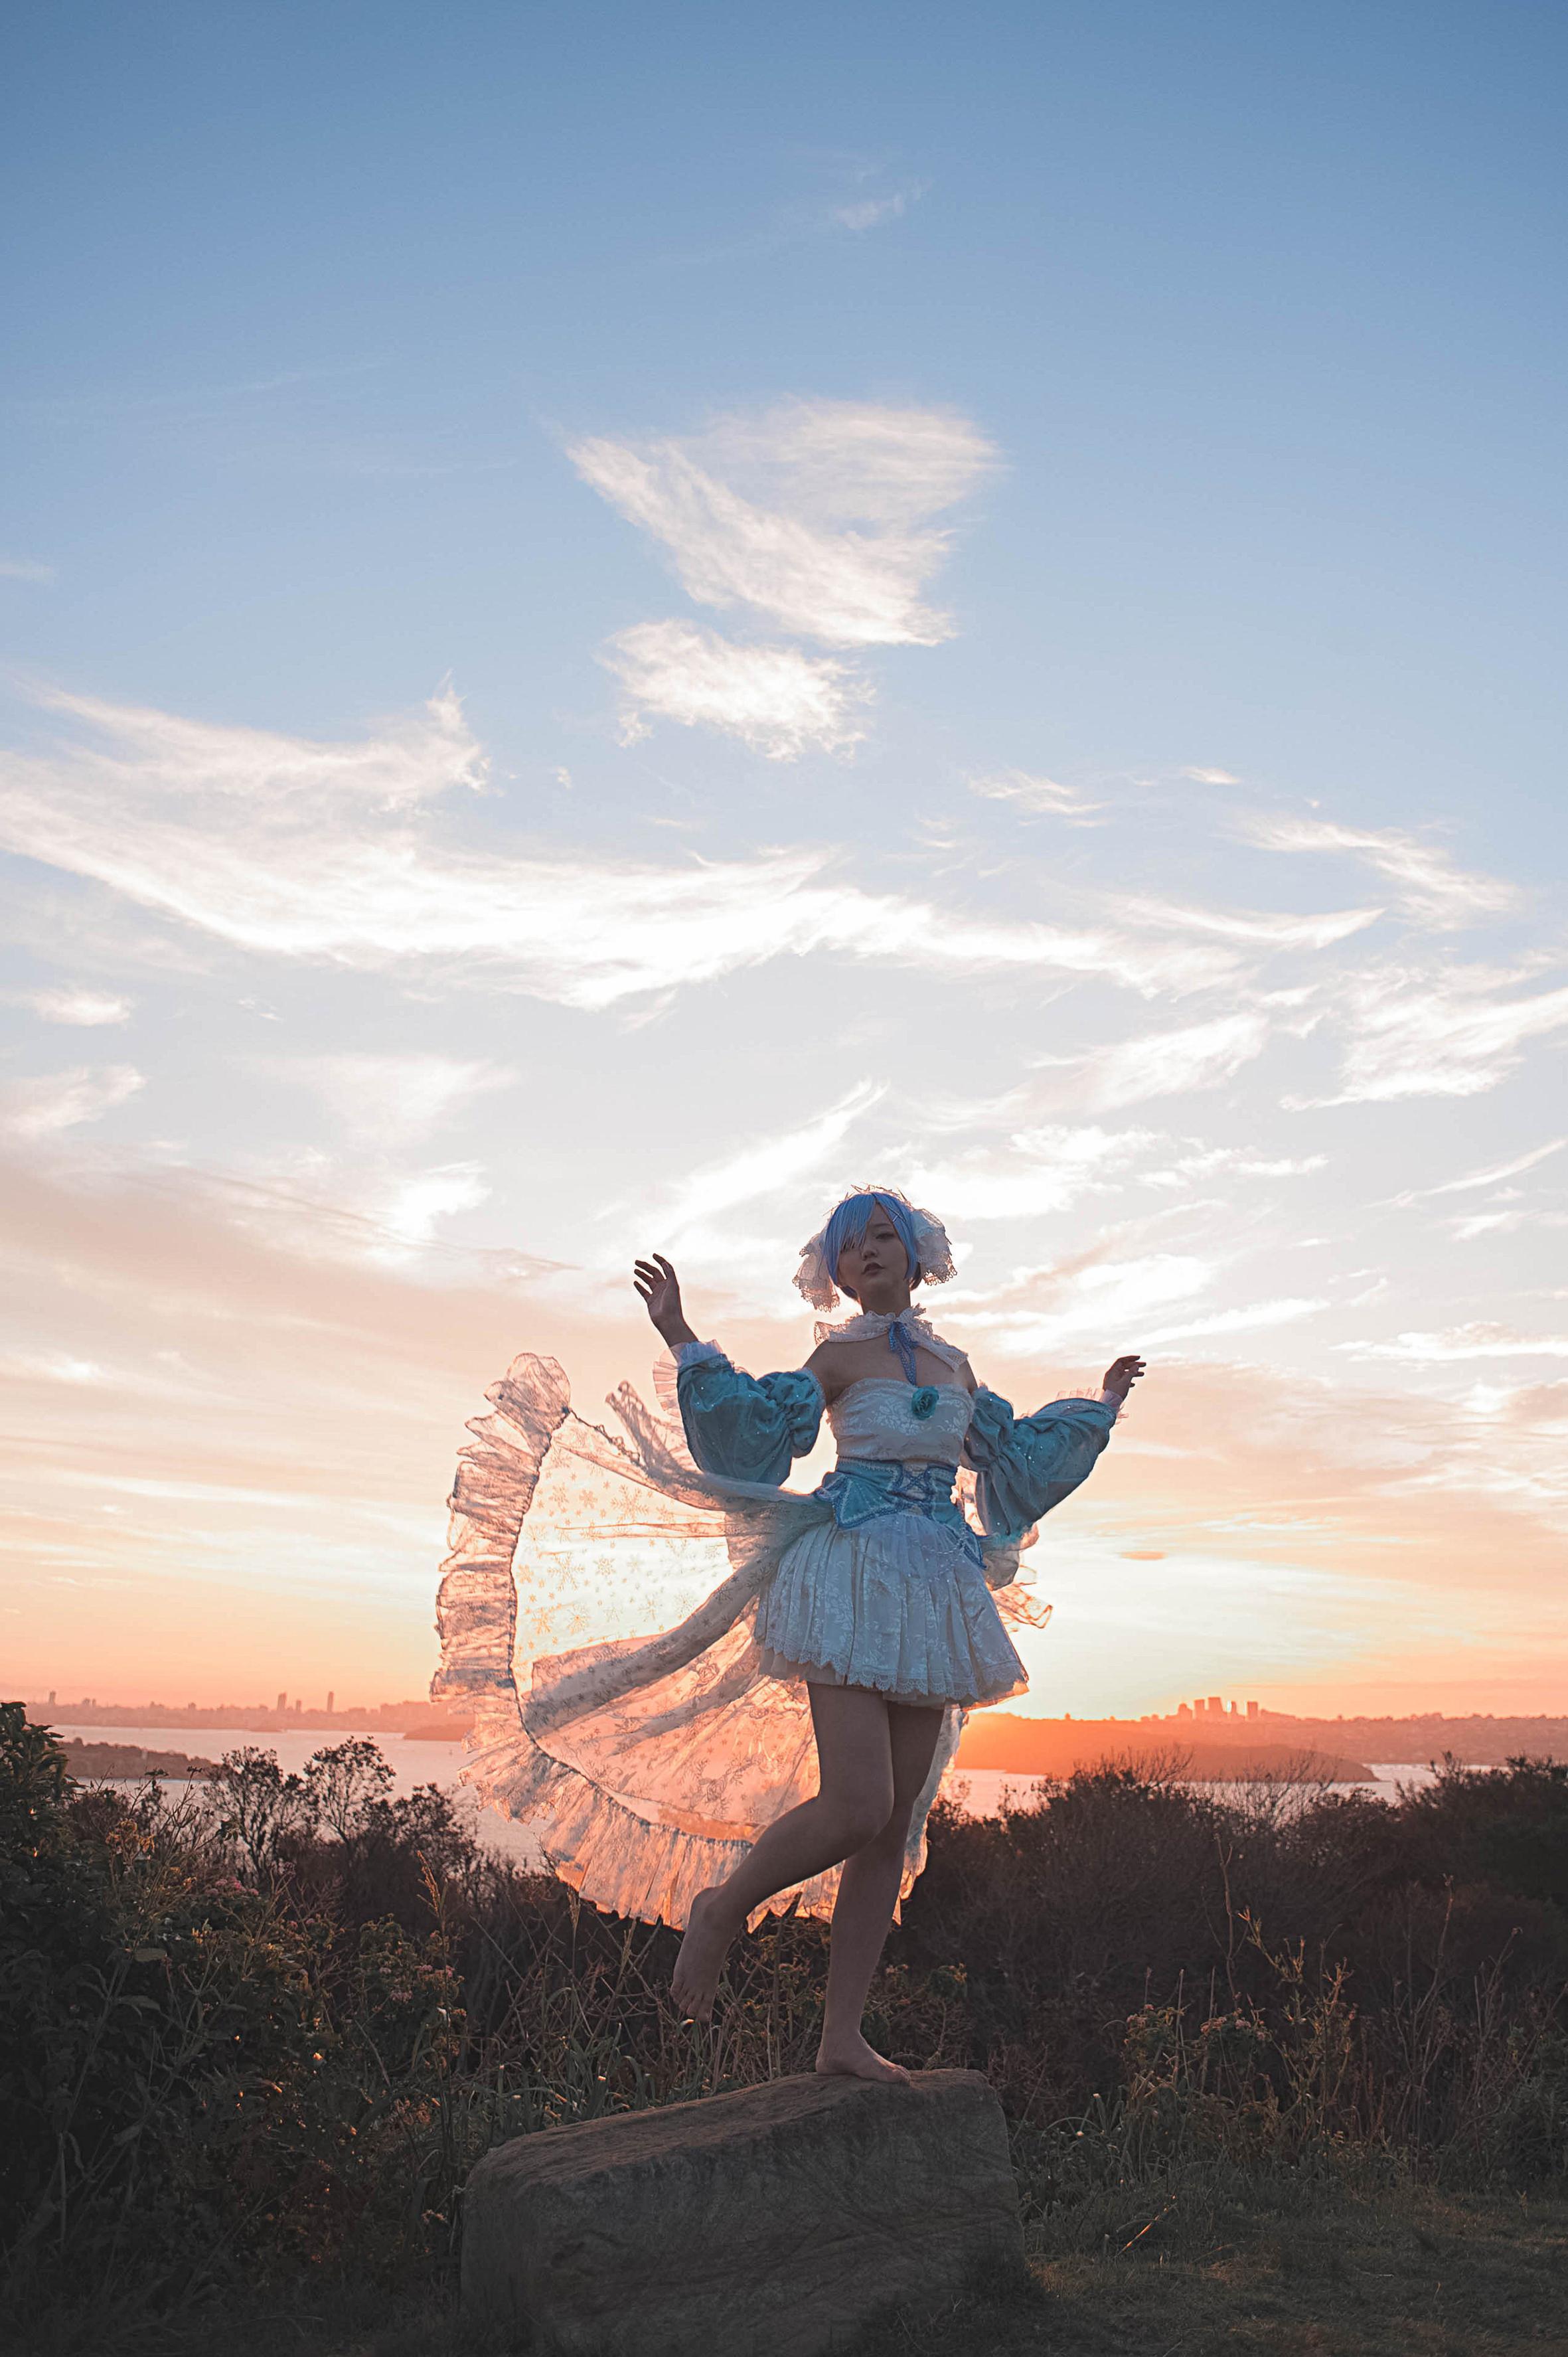 《RE:从零开始的异世界生活》从零开始的异世界生活蕾姆cosplay【CN:Kyuu_九笛】-第9张